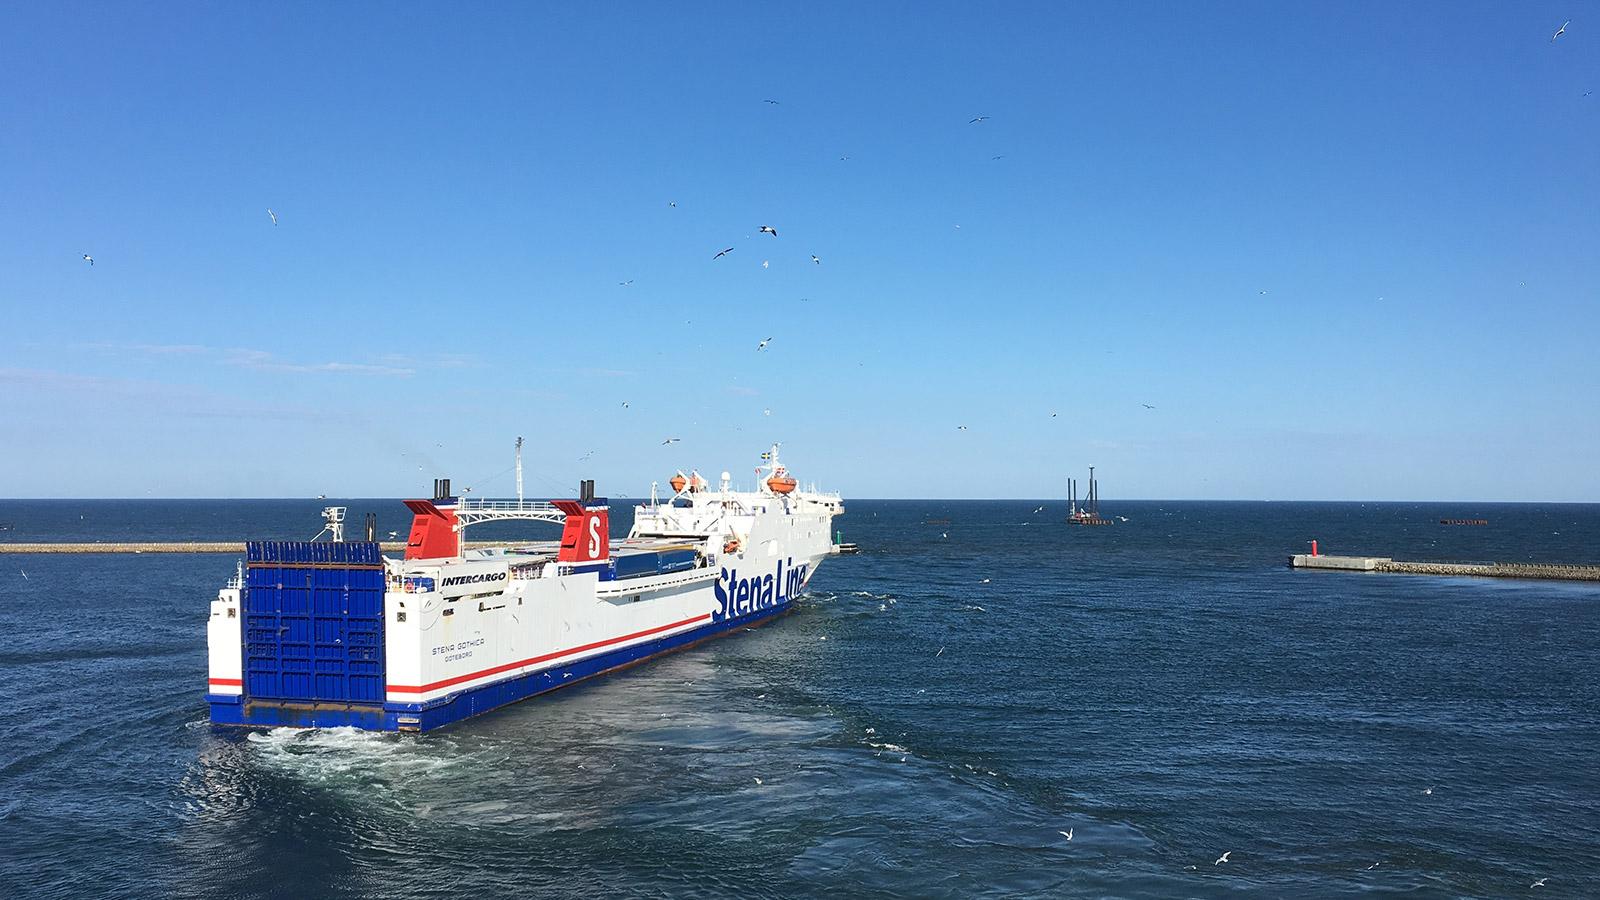 Stena Line – A Communications Platform to Keep Europe Sailing